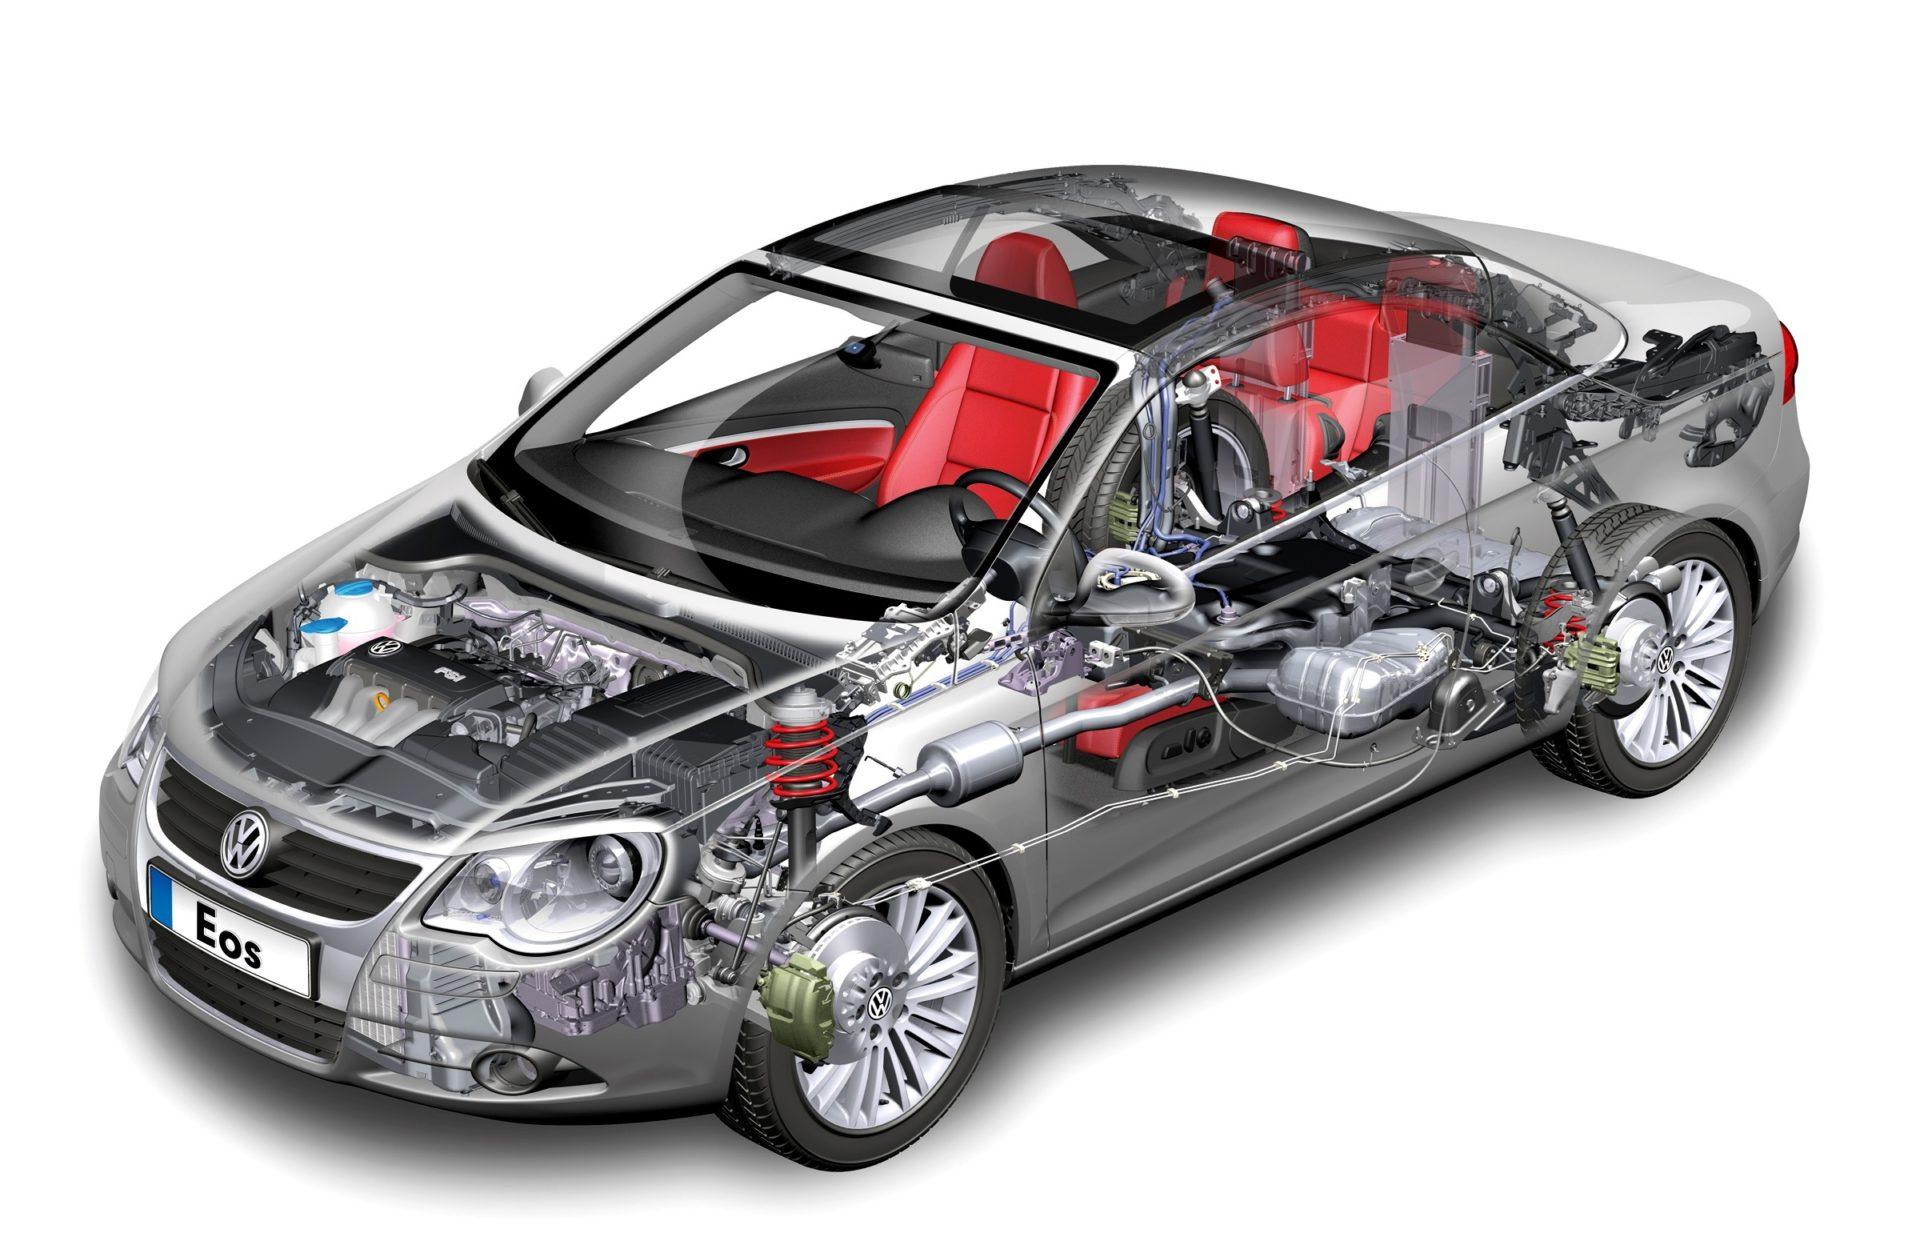 Volkswagen Eos, Volkswagen, Eos, Golf GTi, Golf, GTi, Volkswagen Golf GTi, Volkswagen Golf, coupe convertible, convertible, drop top, car, cars, classic car, retro car, motoring, automotive, ebay motors, ebay, autotrader, www.not2grand.co.uk, not2grand, adrian flux, featured, motoring, automotive, car, cars, Eos buying guide